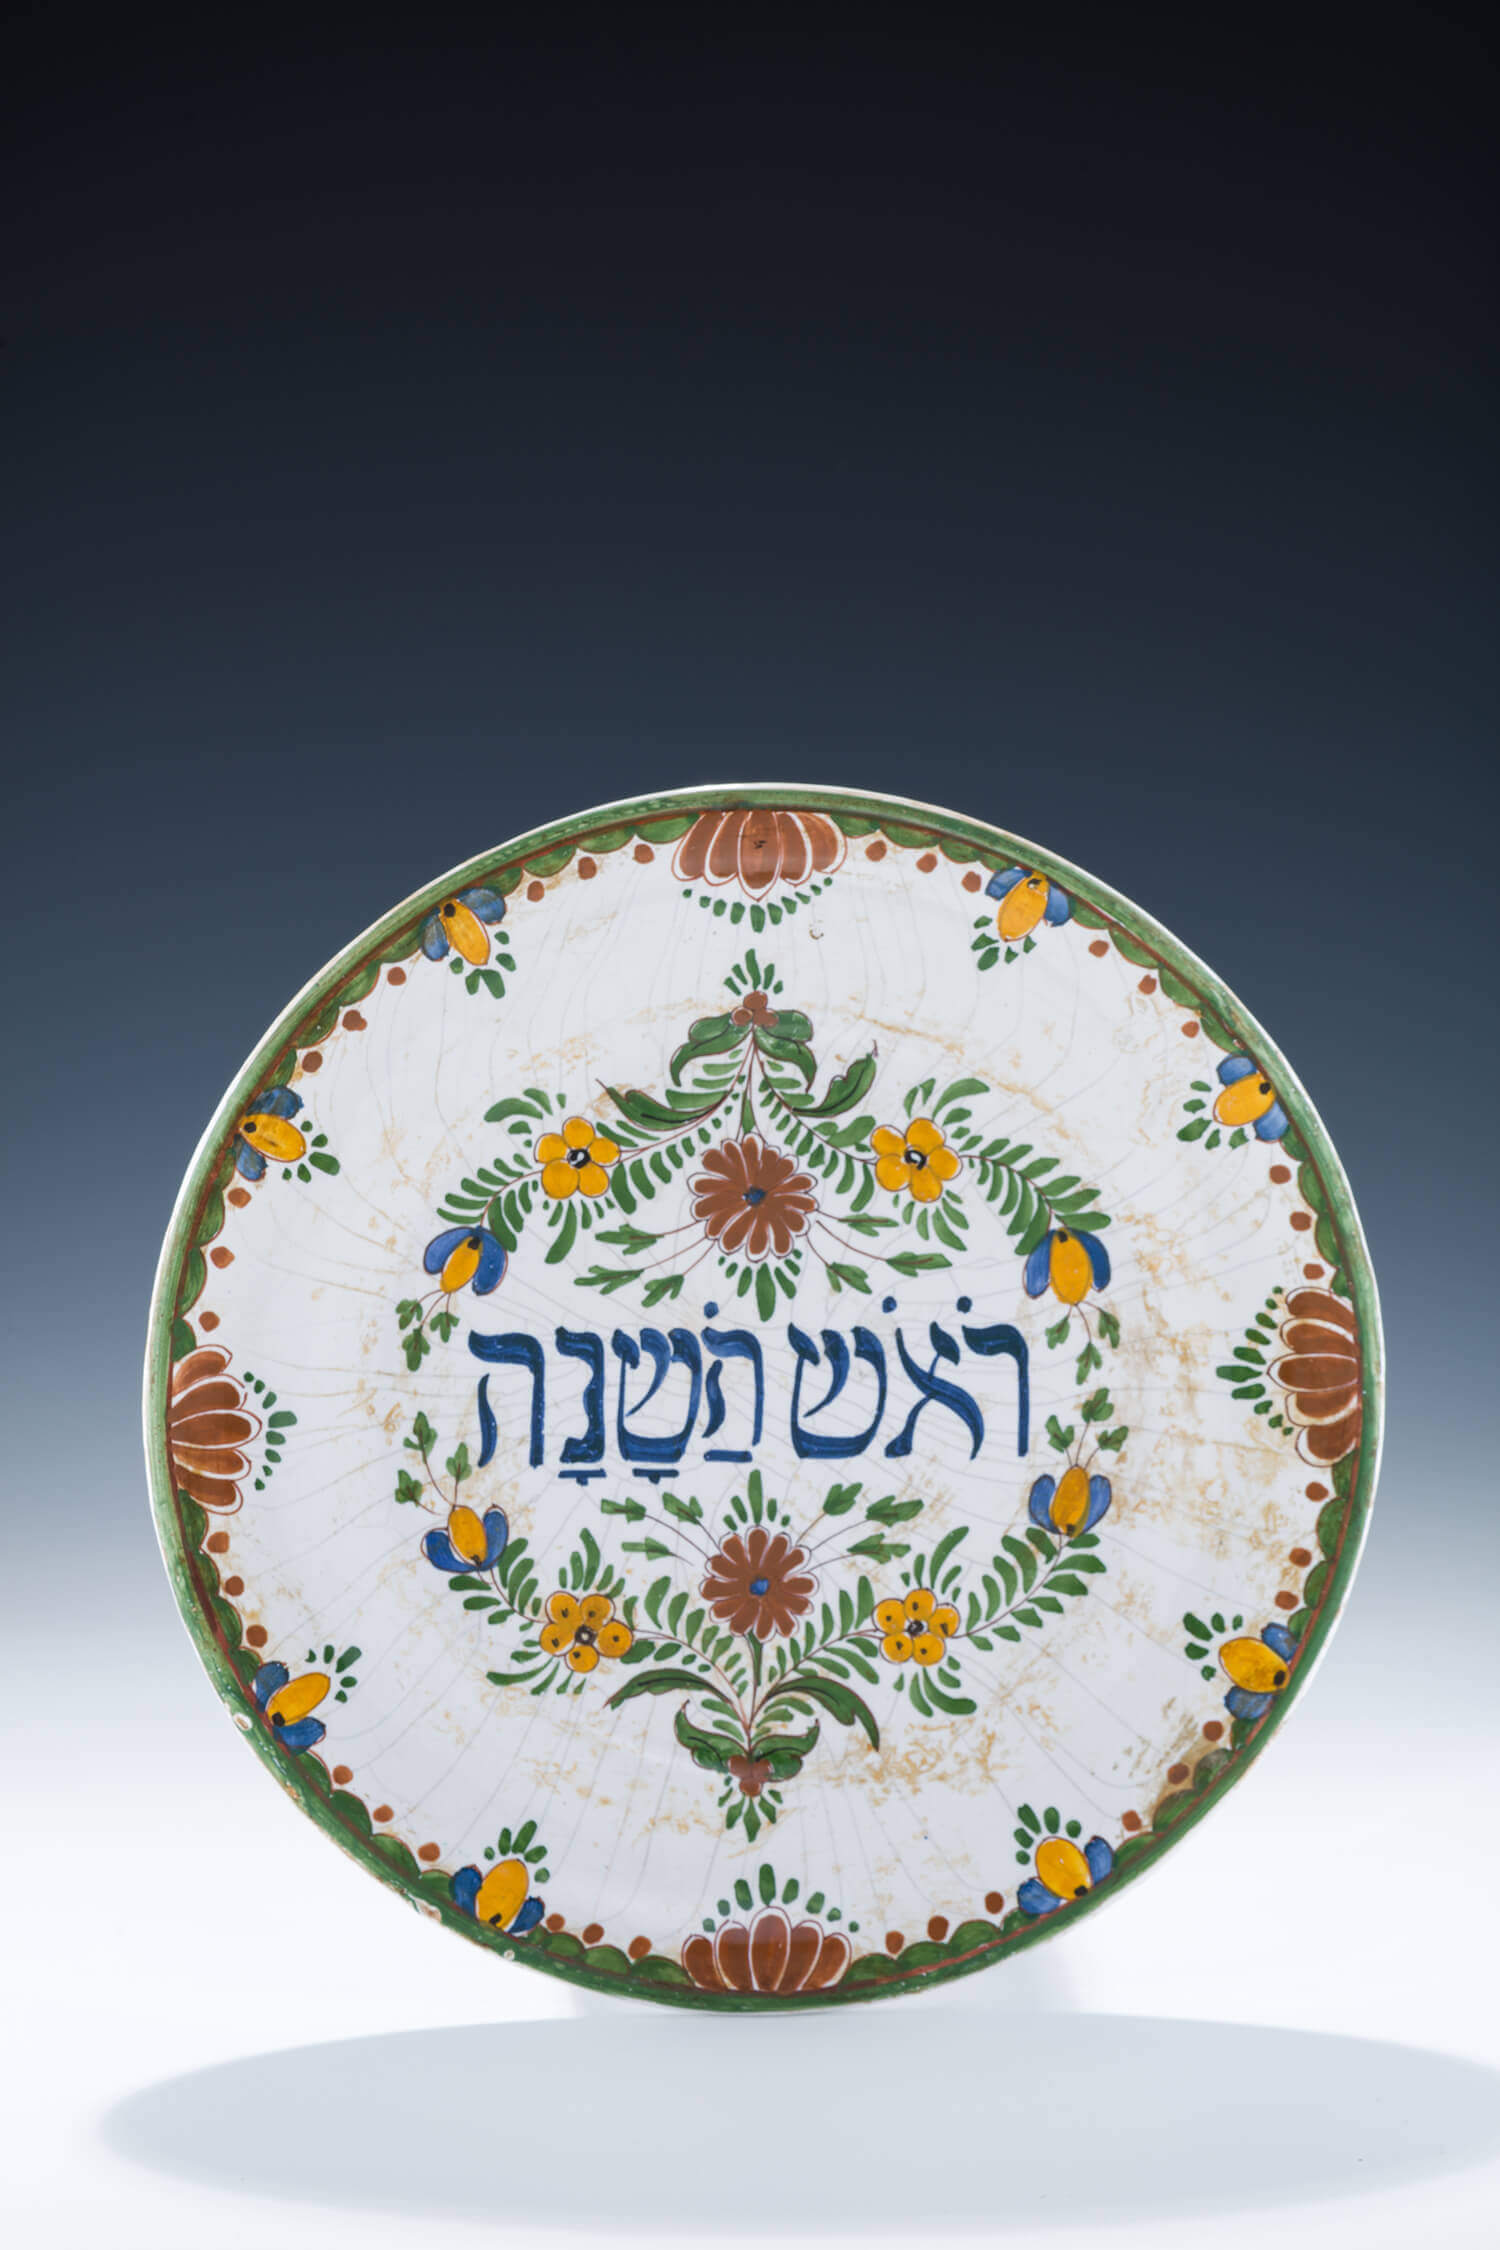 019. AN EARLY ROSH HASHANAH DISH